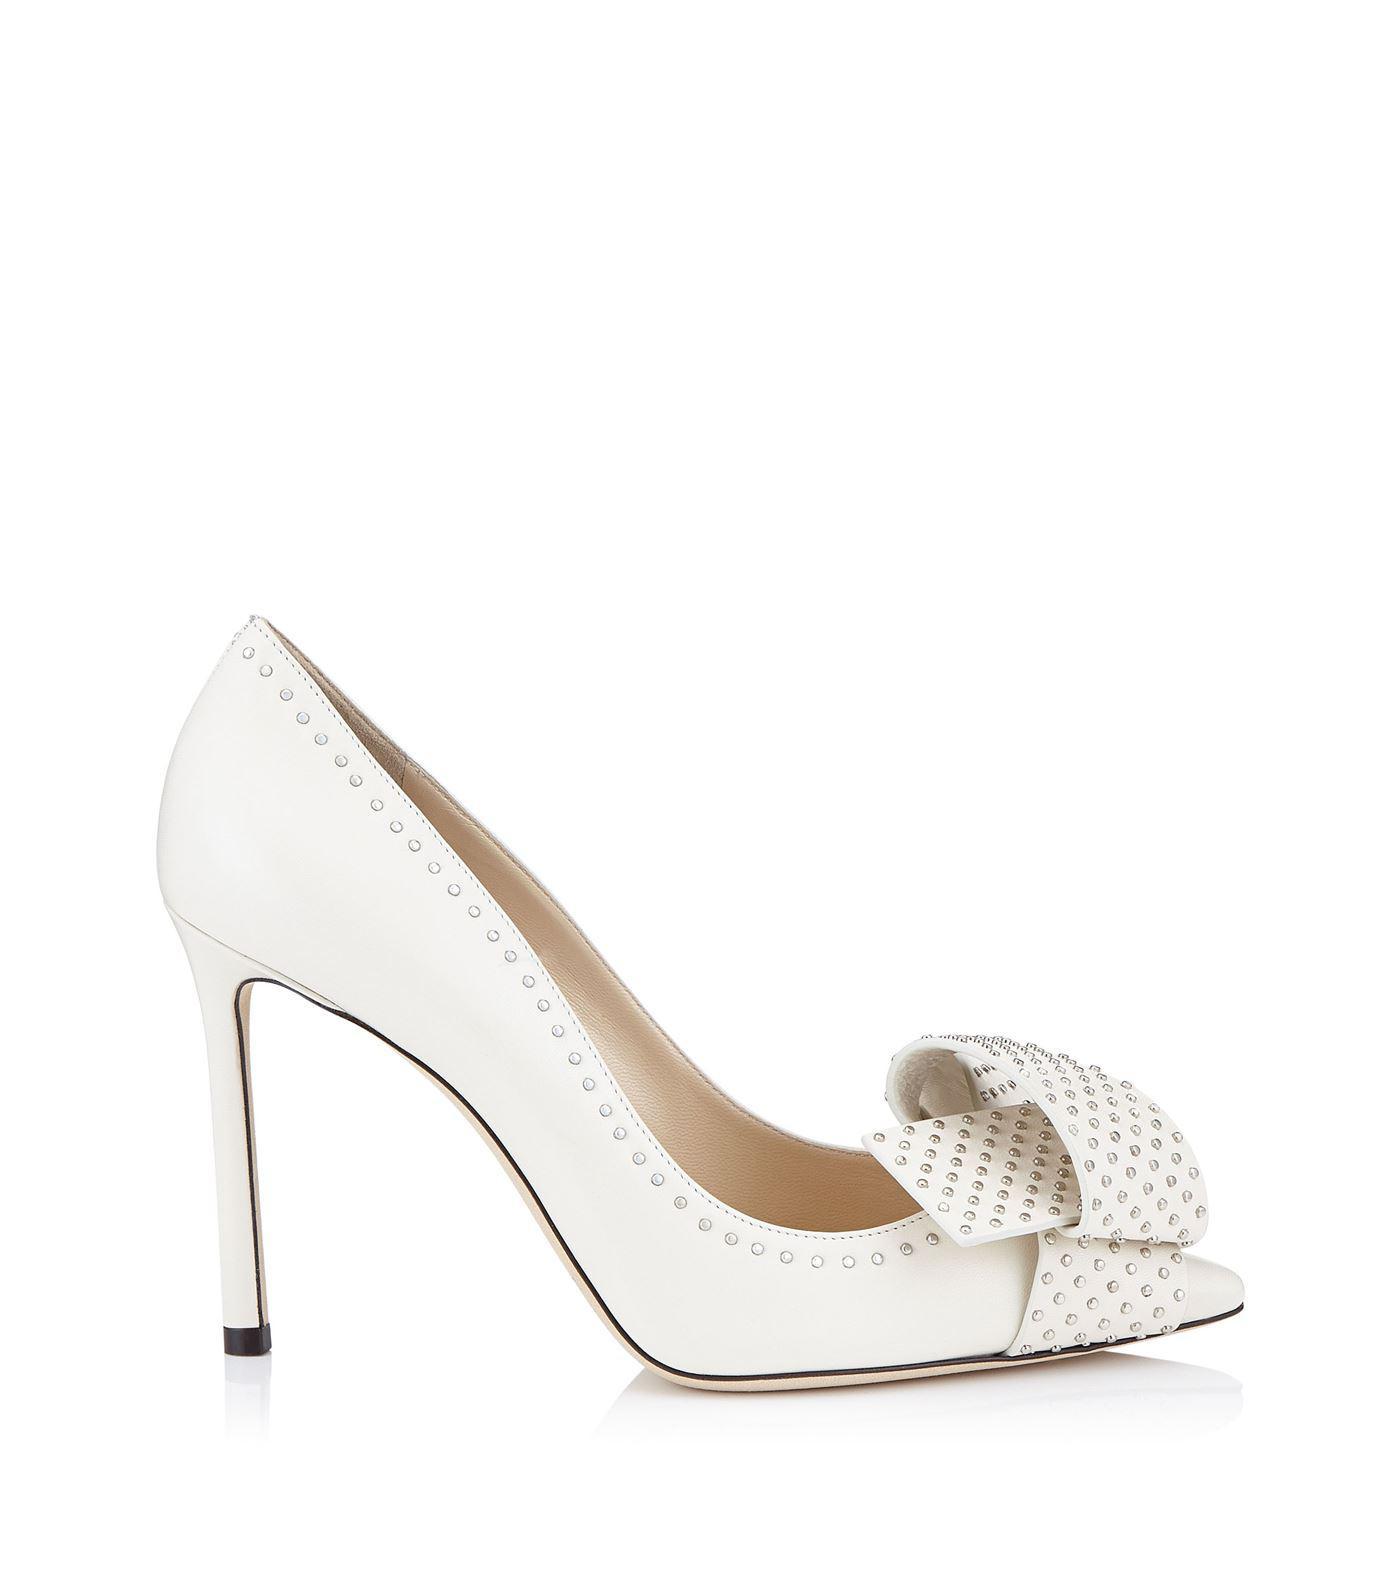 3e9daf2916c4 Jimmy Choo. Women s Metallic Tegan 100 Studded Bow Court Shoes